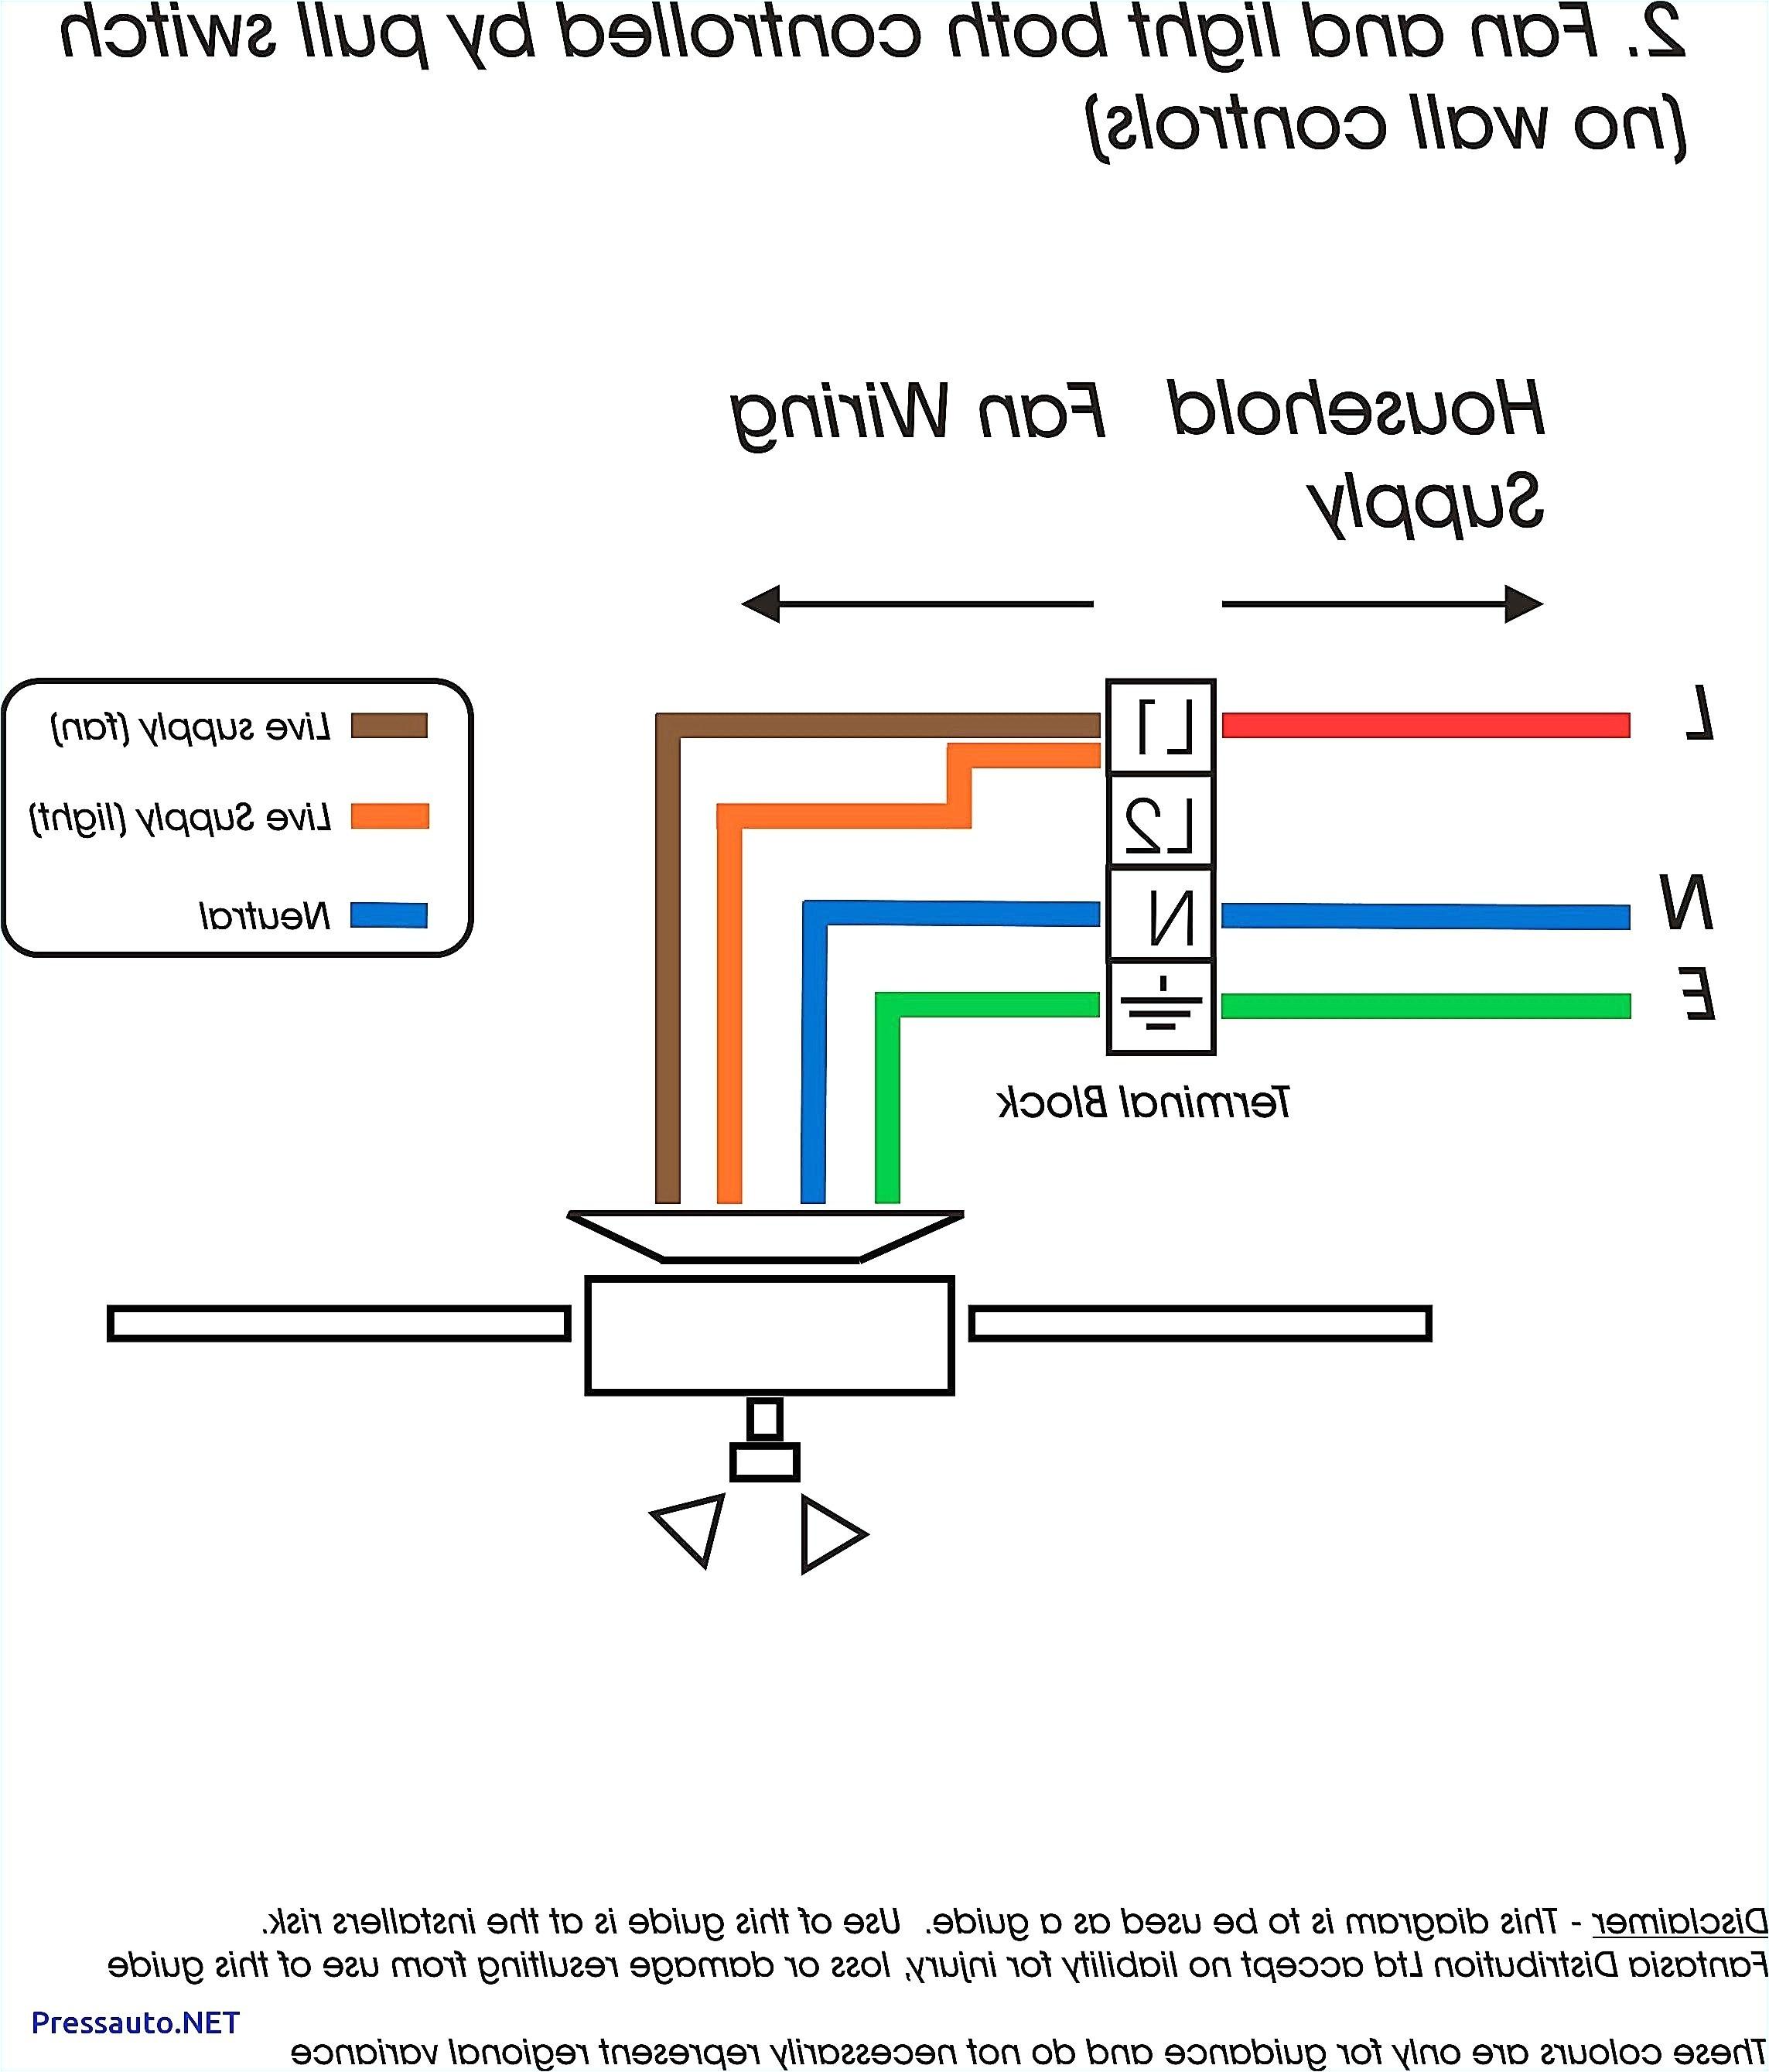 wilson trailer wiring diagram my wiring diagram wilson stock trailer wiring diagram wilson trailer wiring diagrams